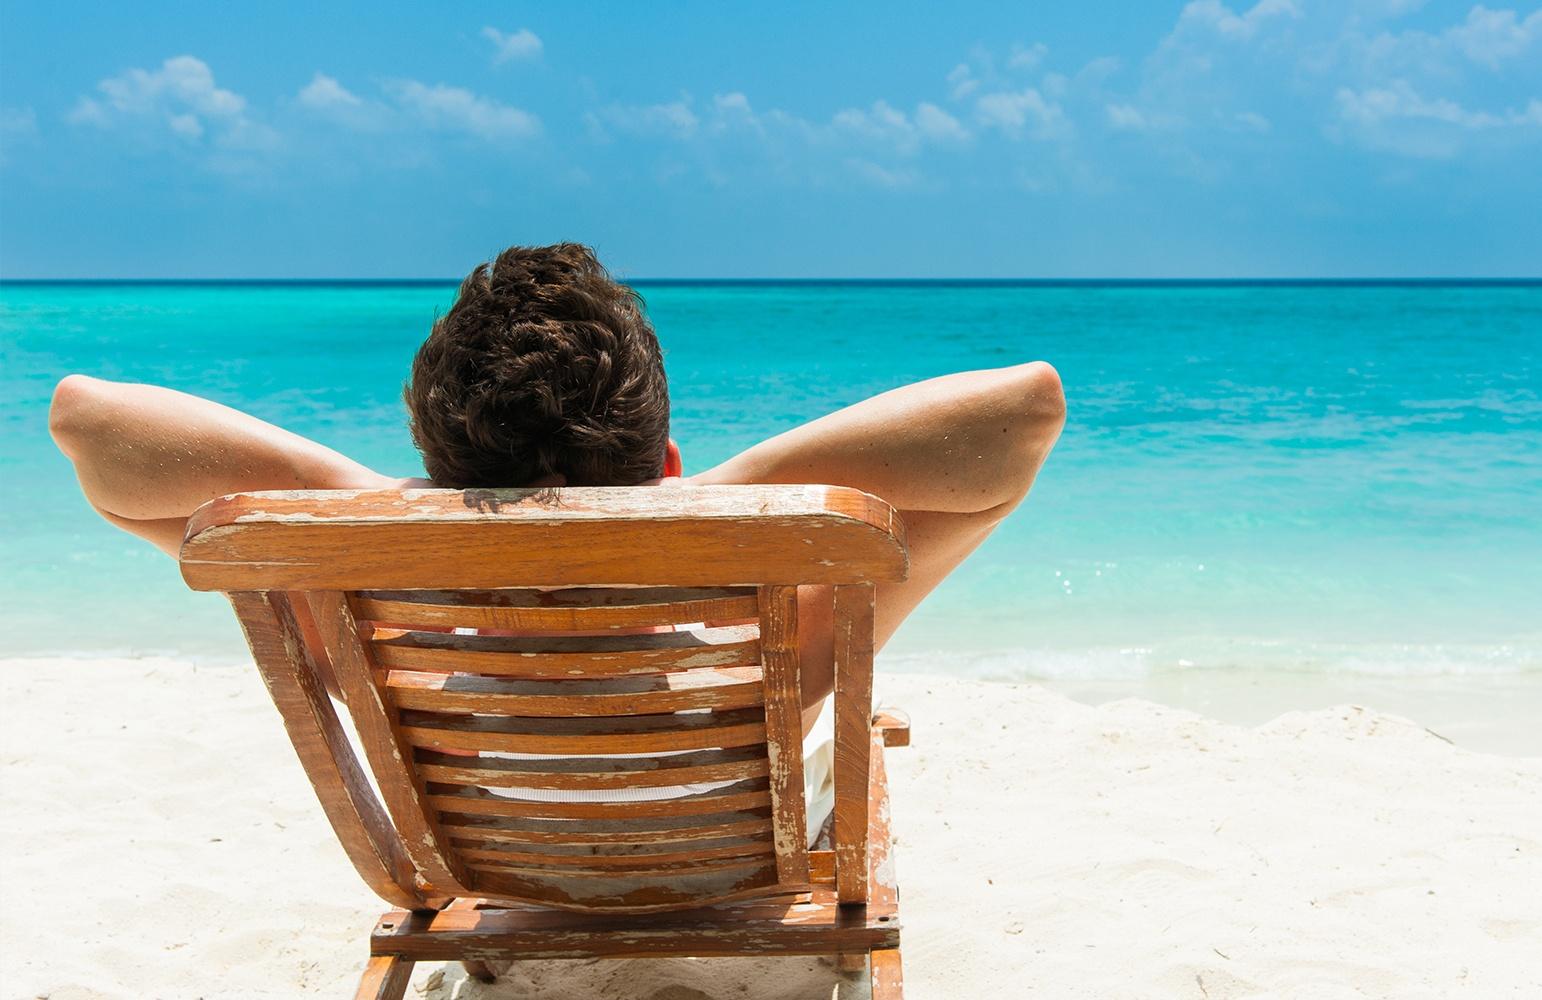 Digital travel insurance